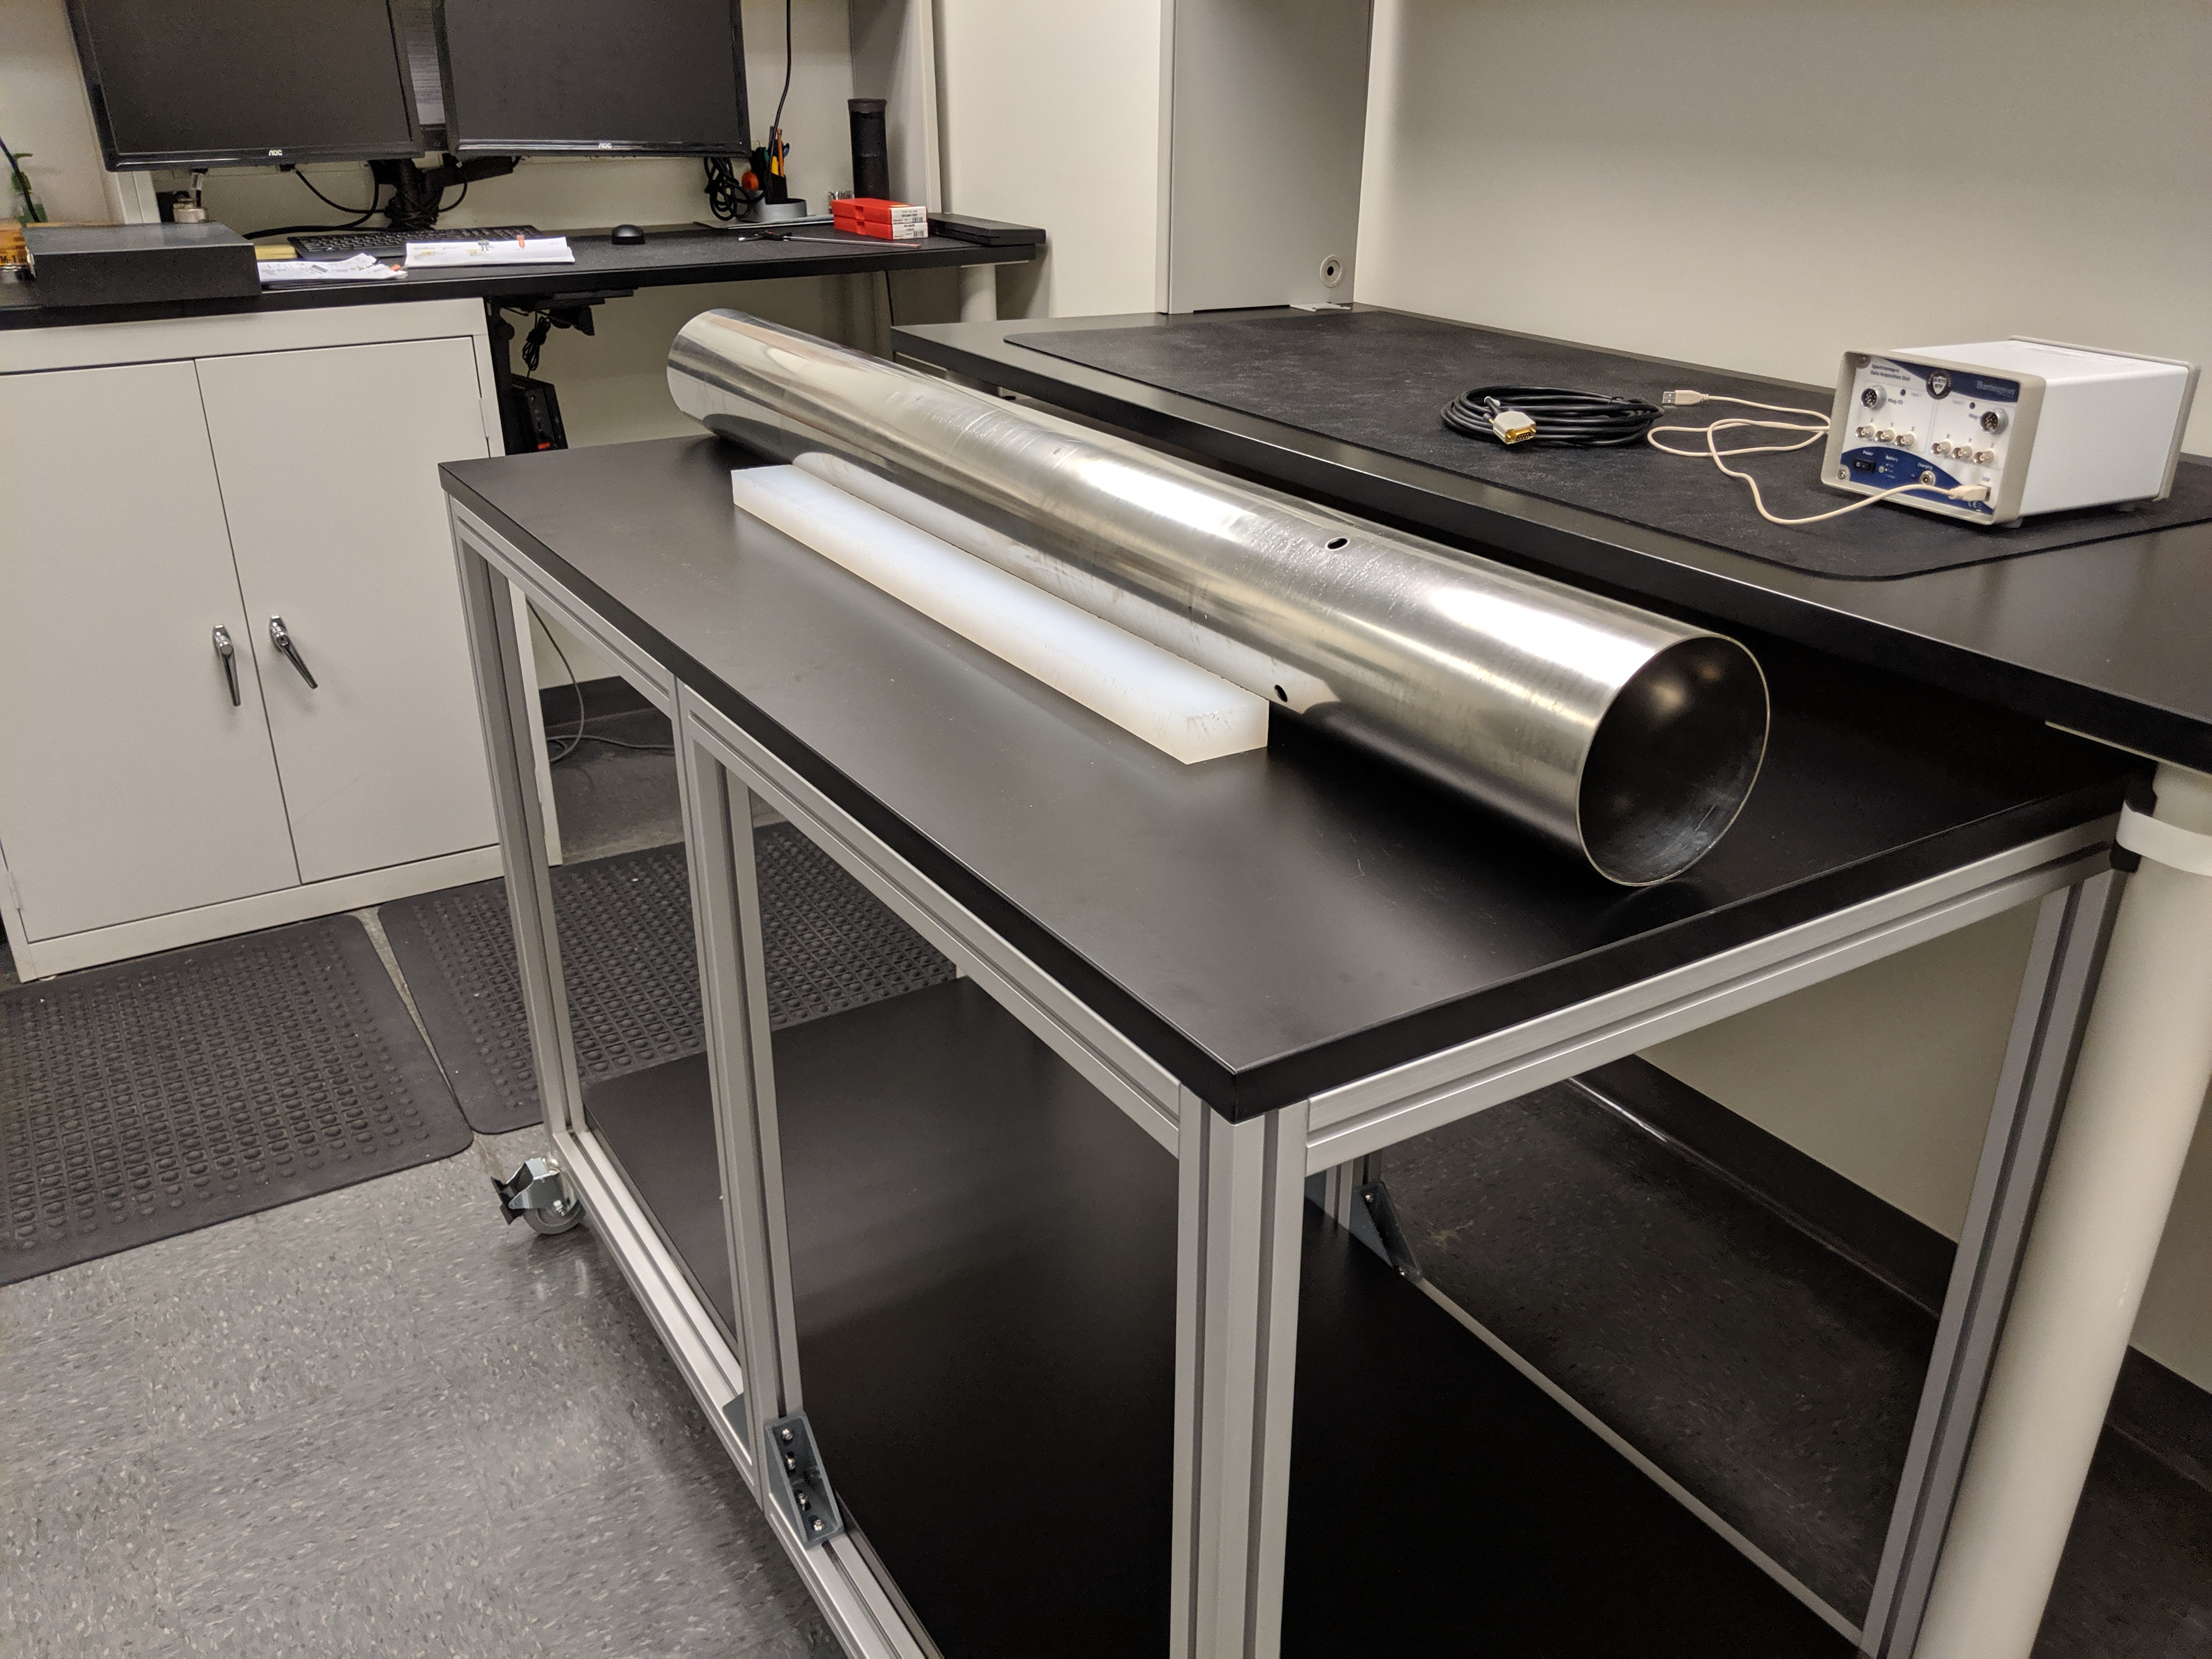 University of California Santa Barbara-large tube